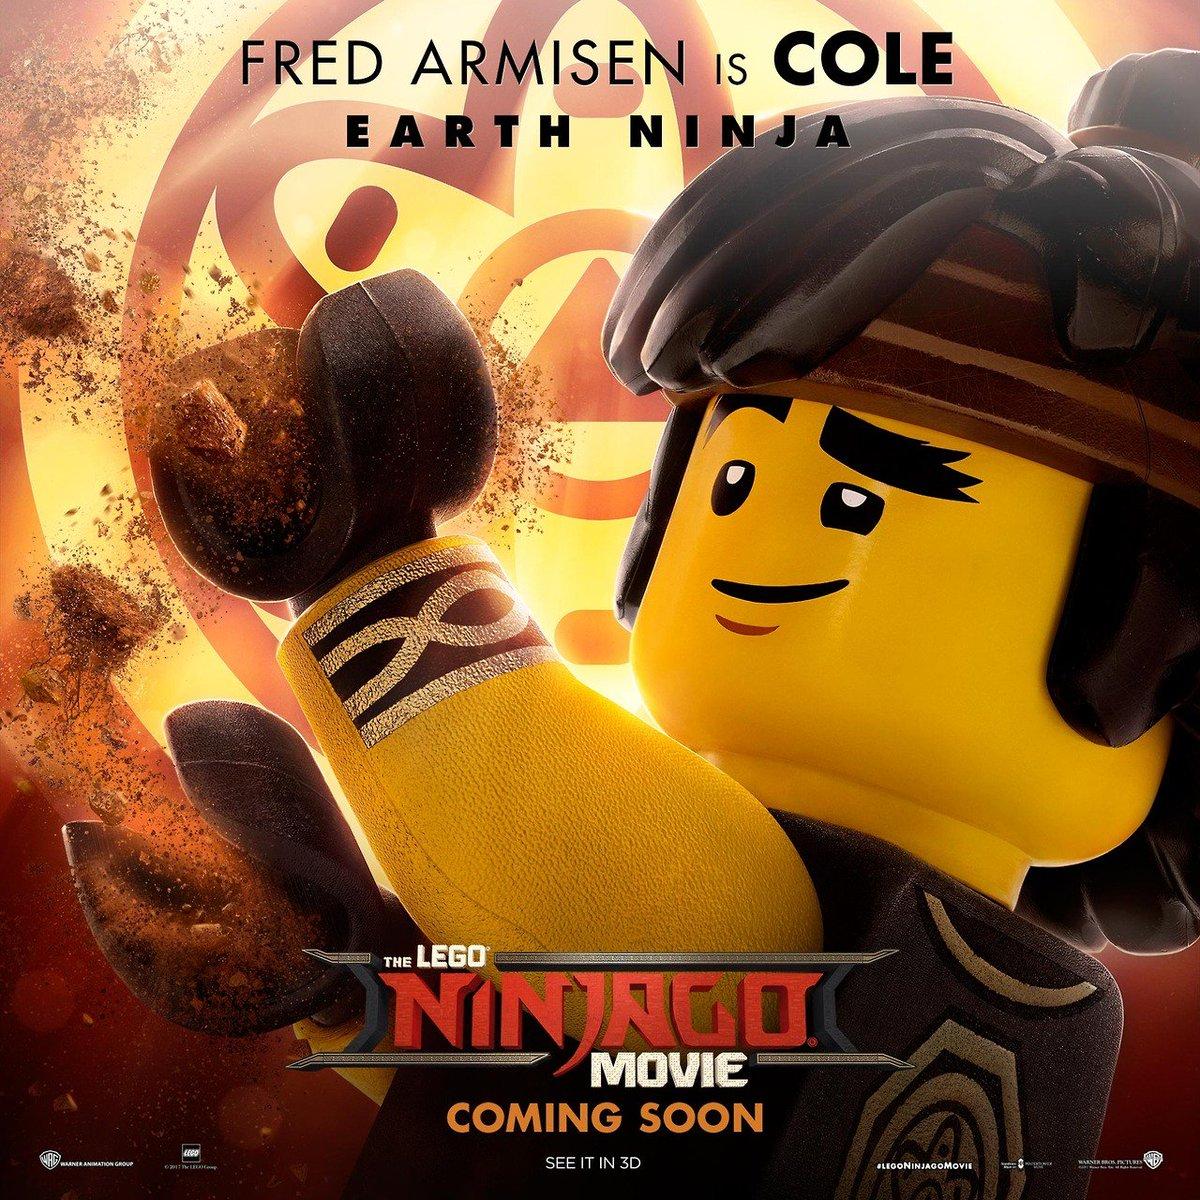 Colebrookstone Hashtag On Twitter Switch Lego Ninjago Movie Video Game English Pal Games 0 Replies 1 Retweet Likes